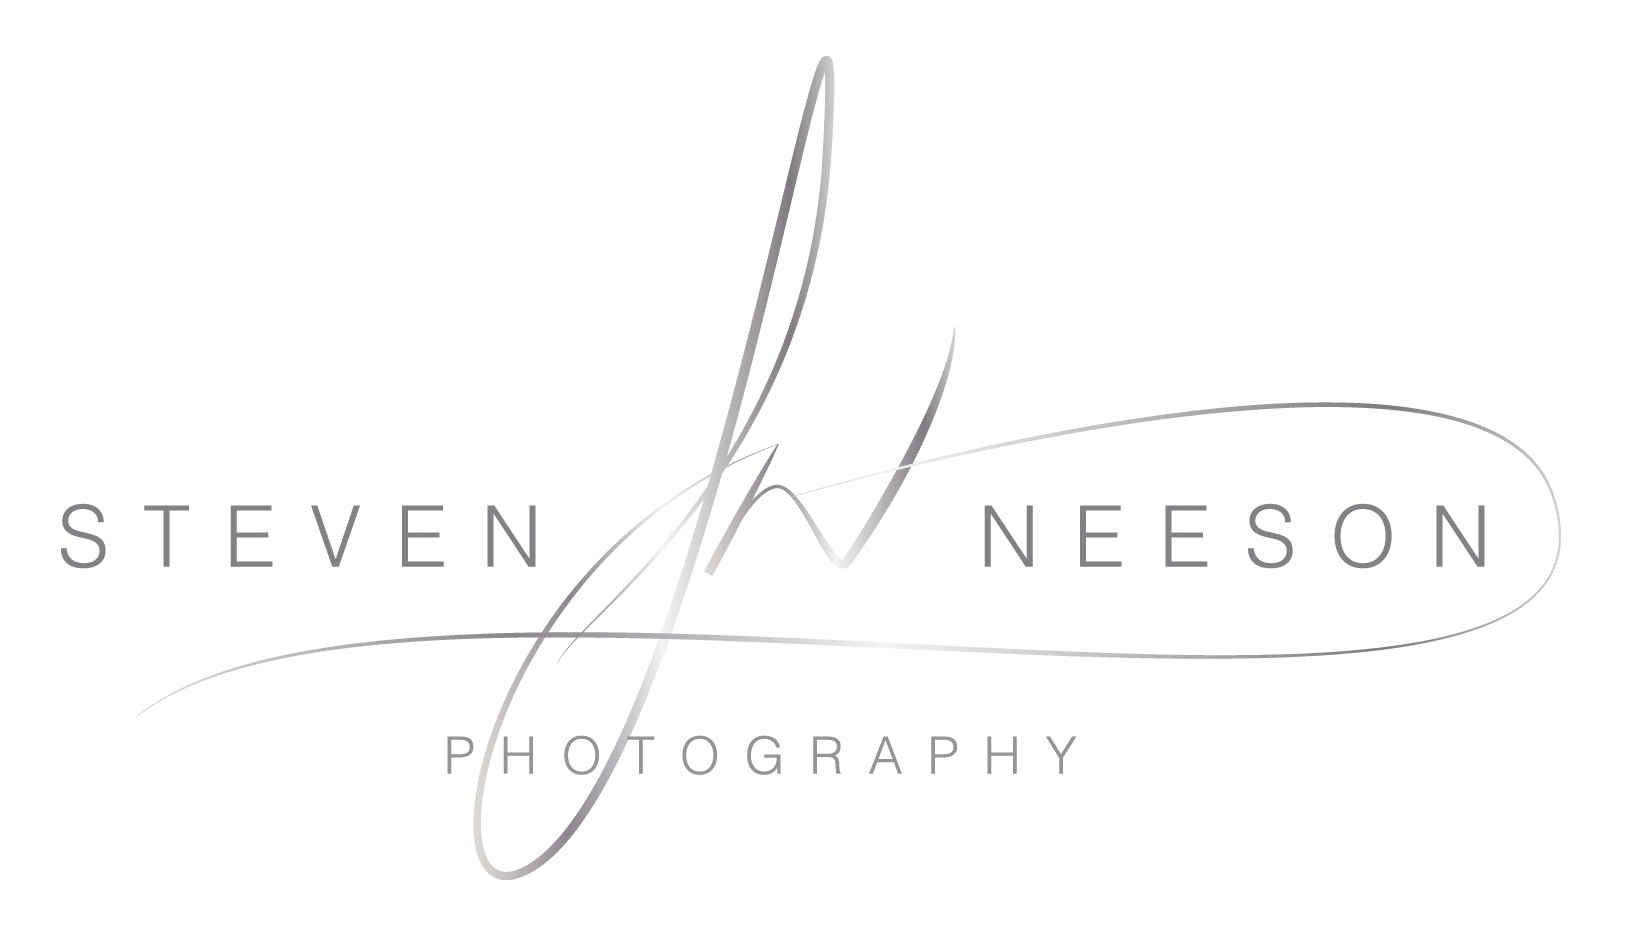 Steven Neeson Photography Logo